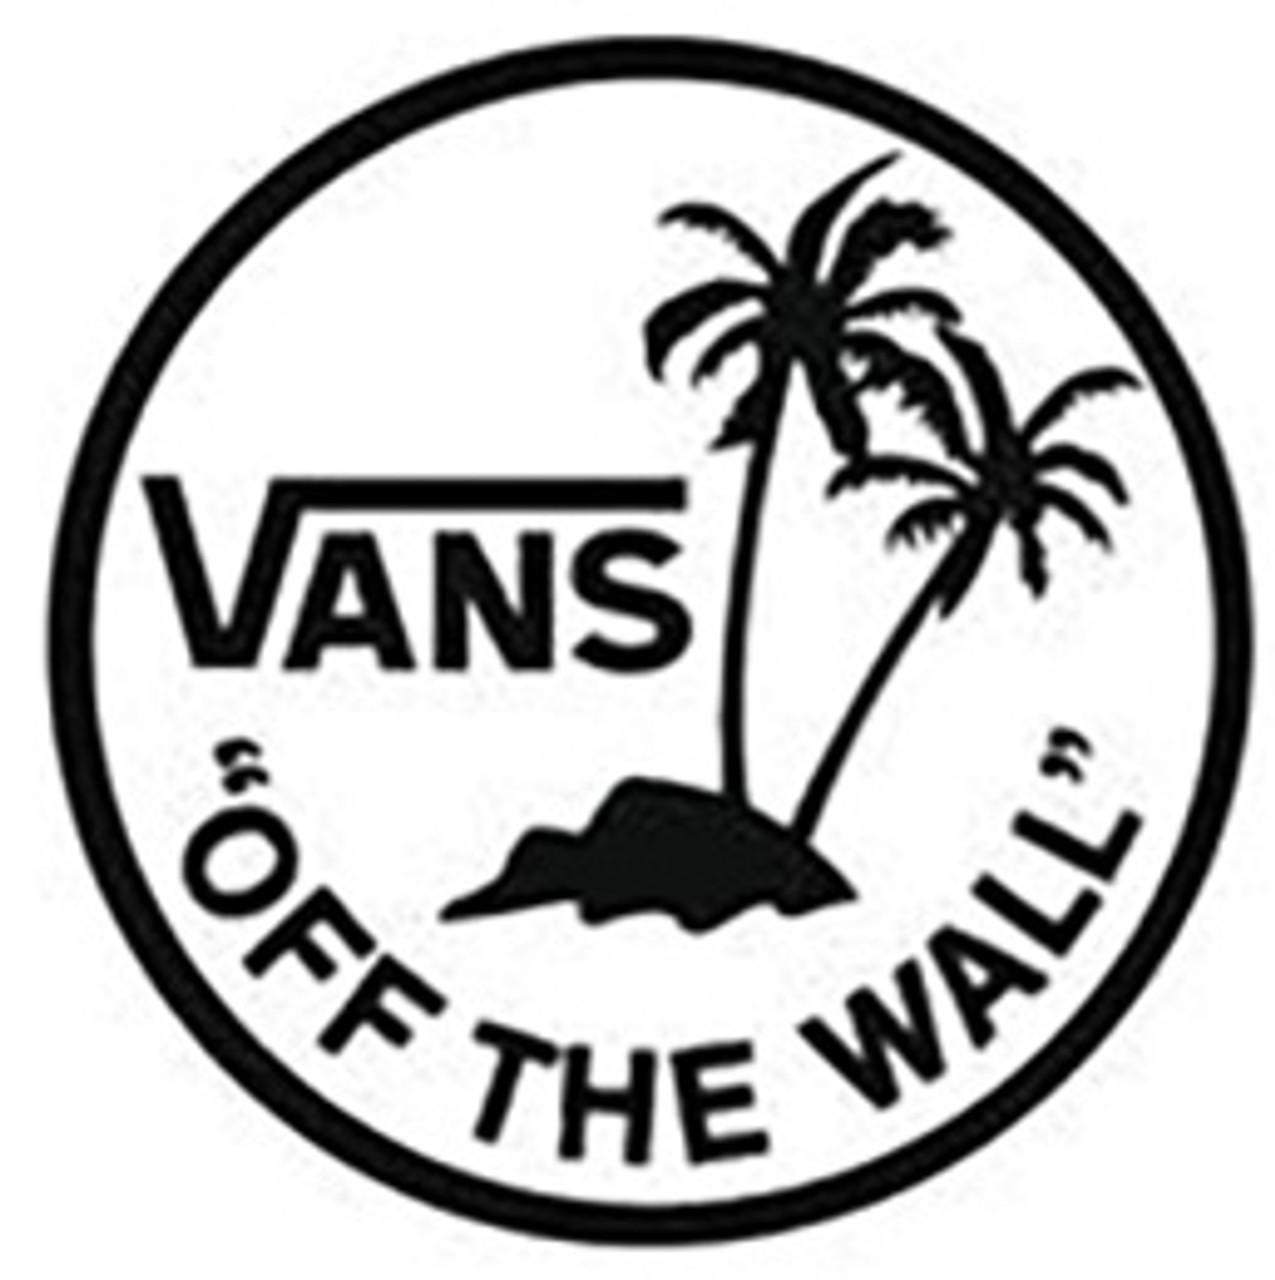 Vans Off The Wall Broloha Vinyl Decal Sticker